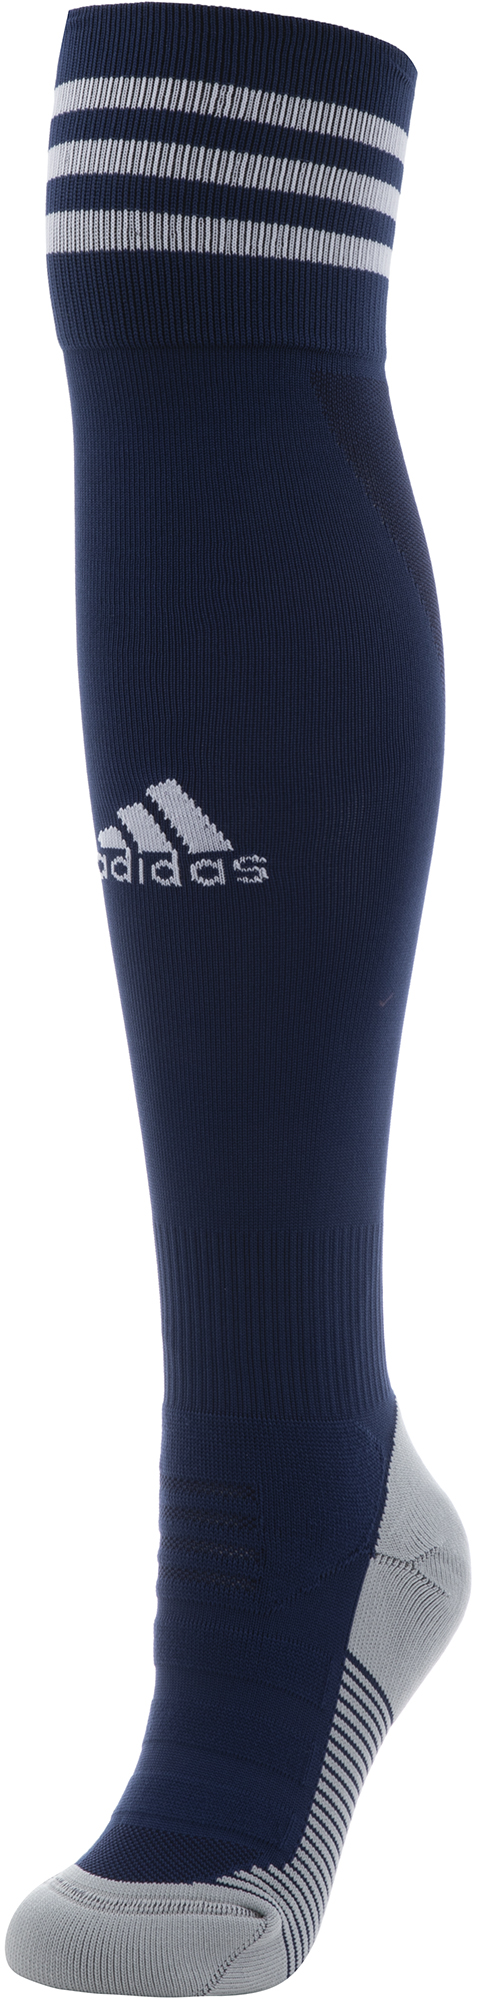 Adidas Гетры футбольные AdiSocks, размер 43-45